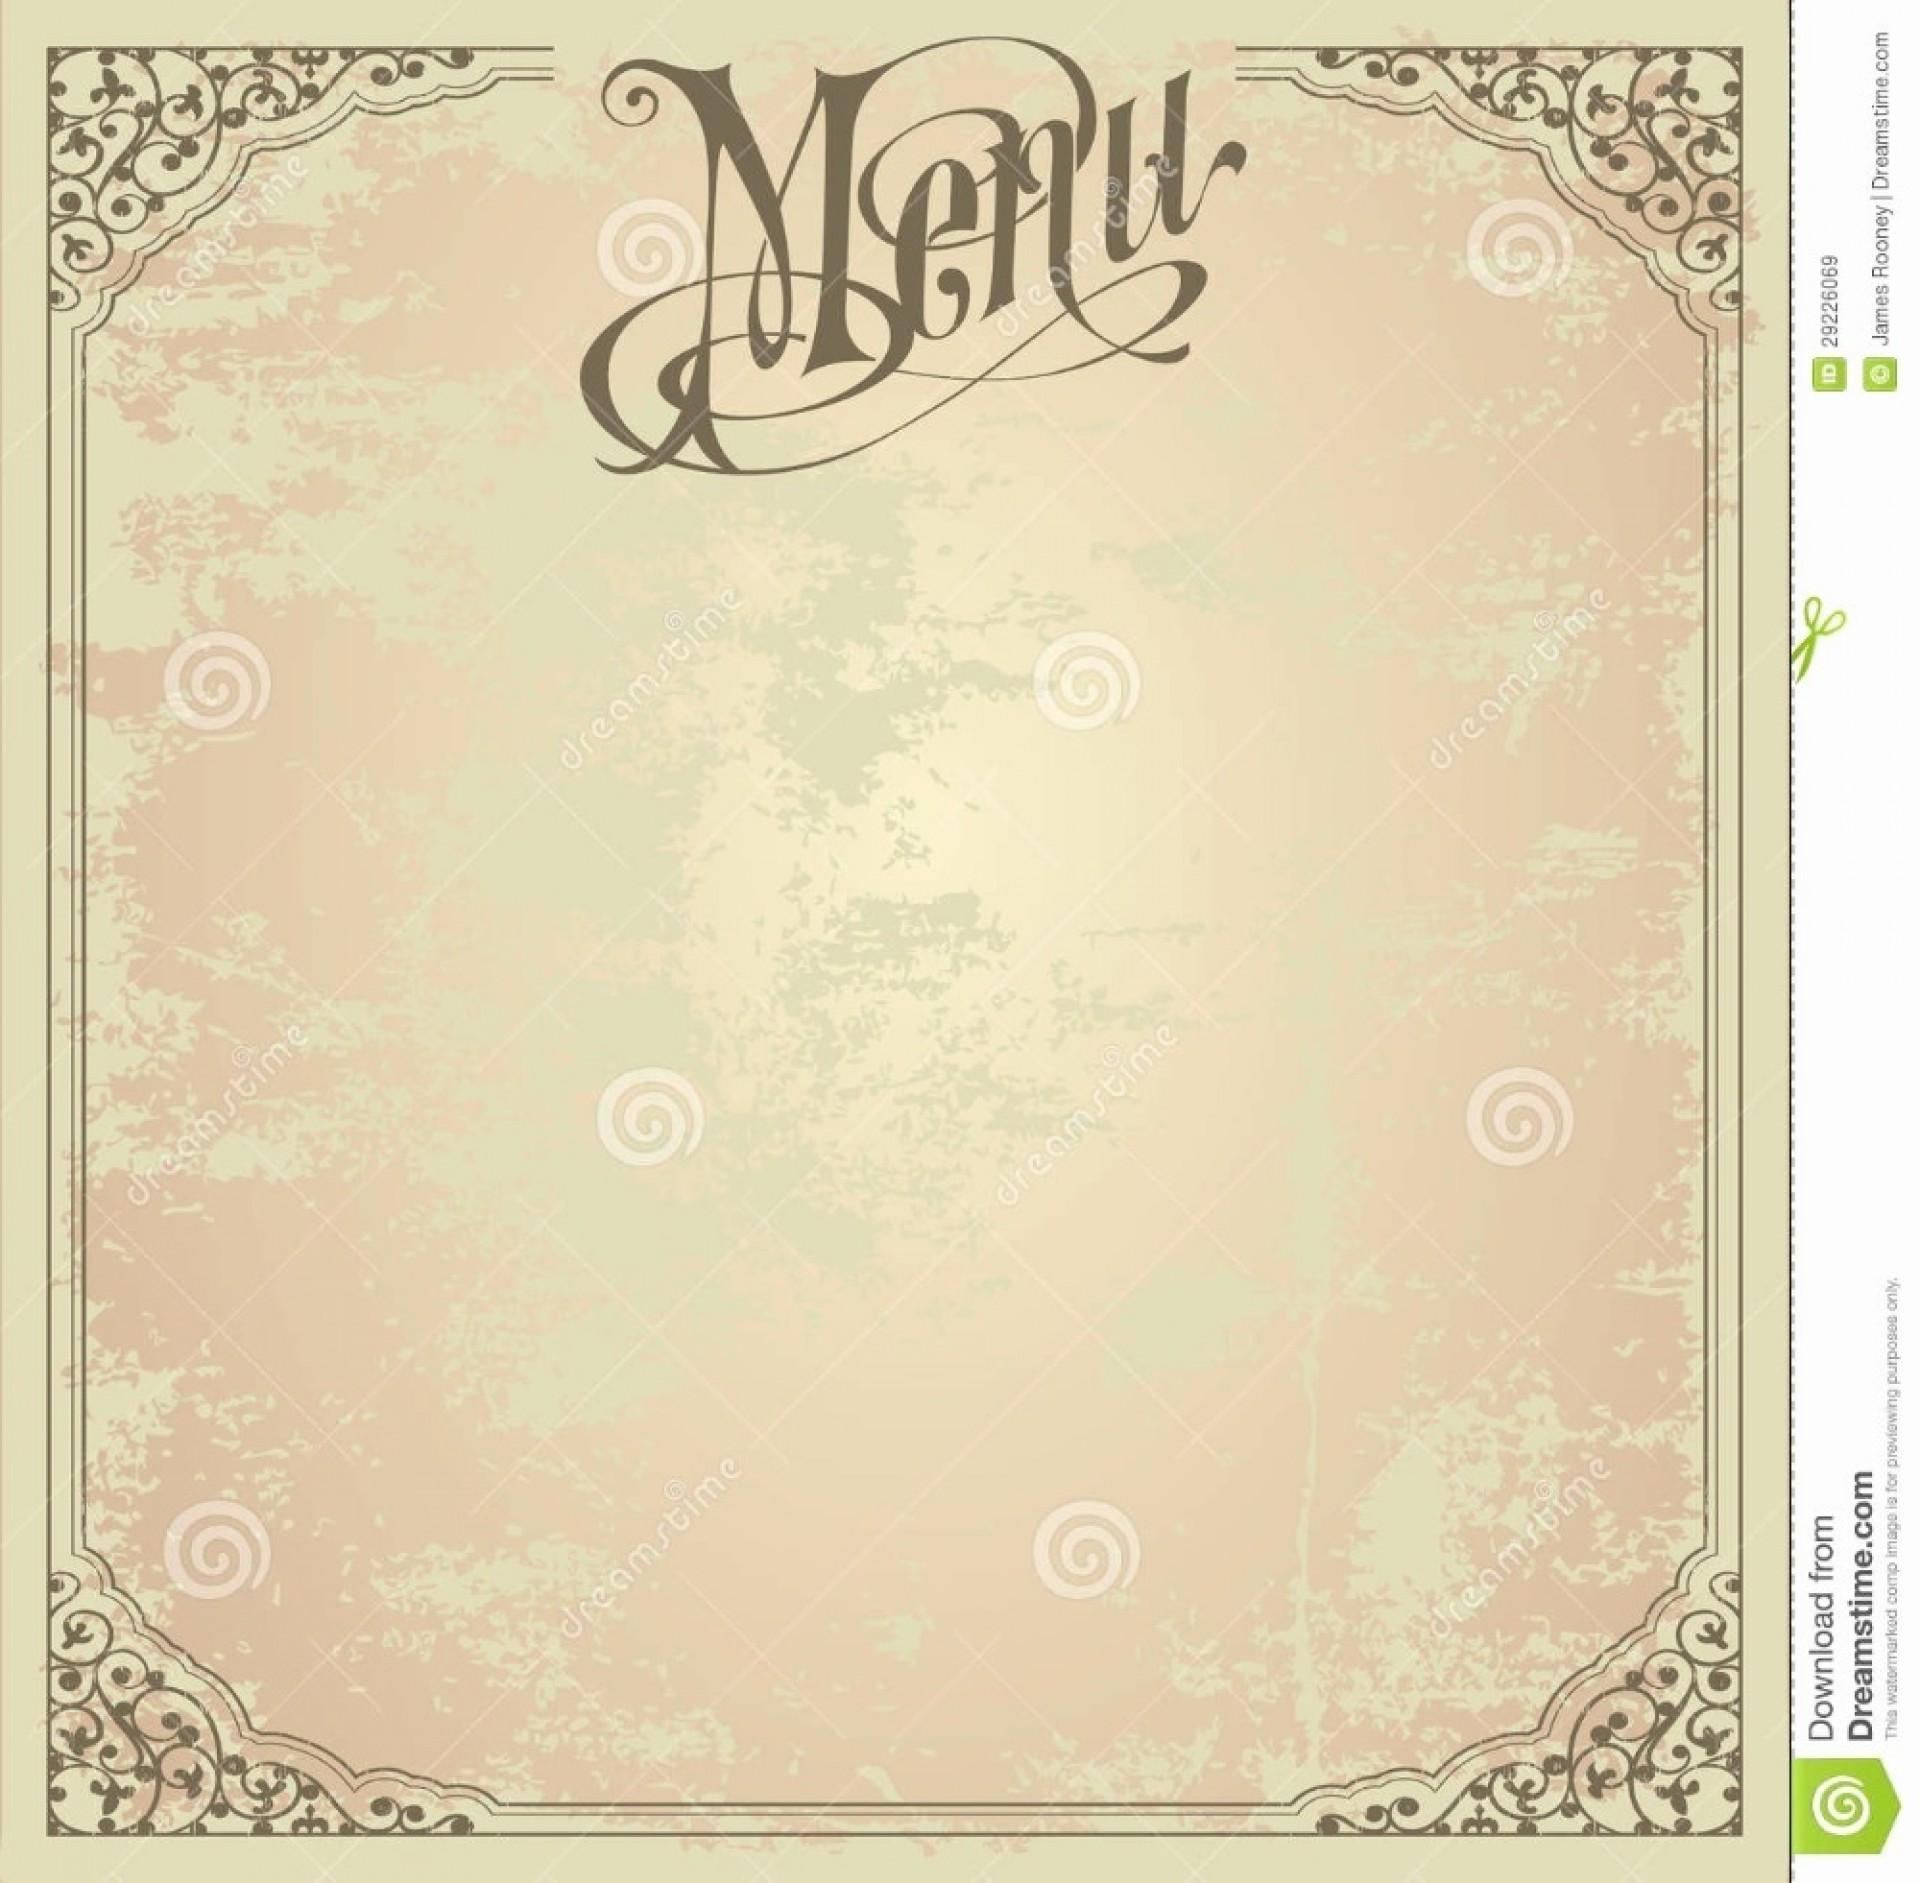 006 Magnificent Blank Restaurant Menu Template Concept  Free Printable Downloadable1920